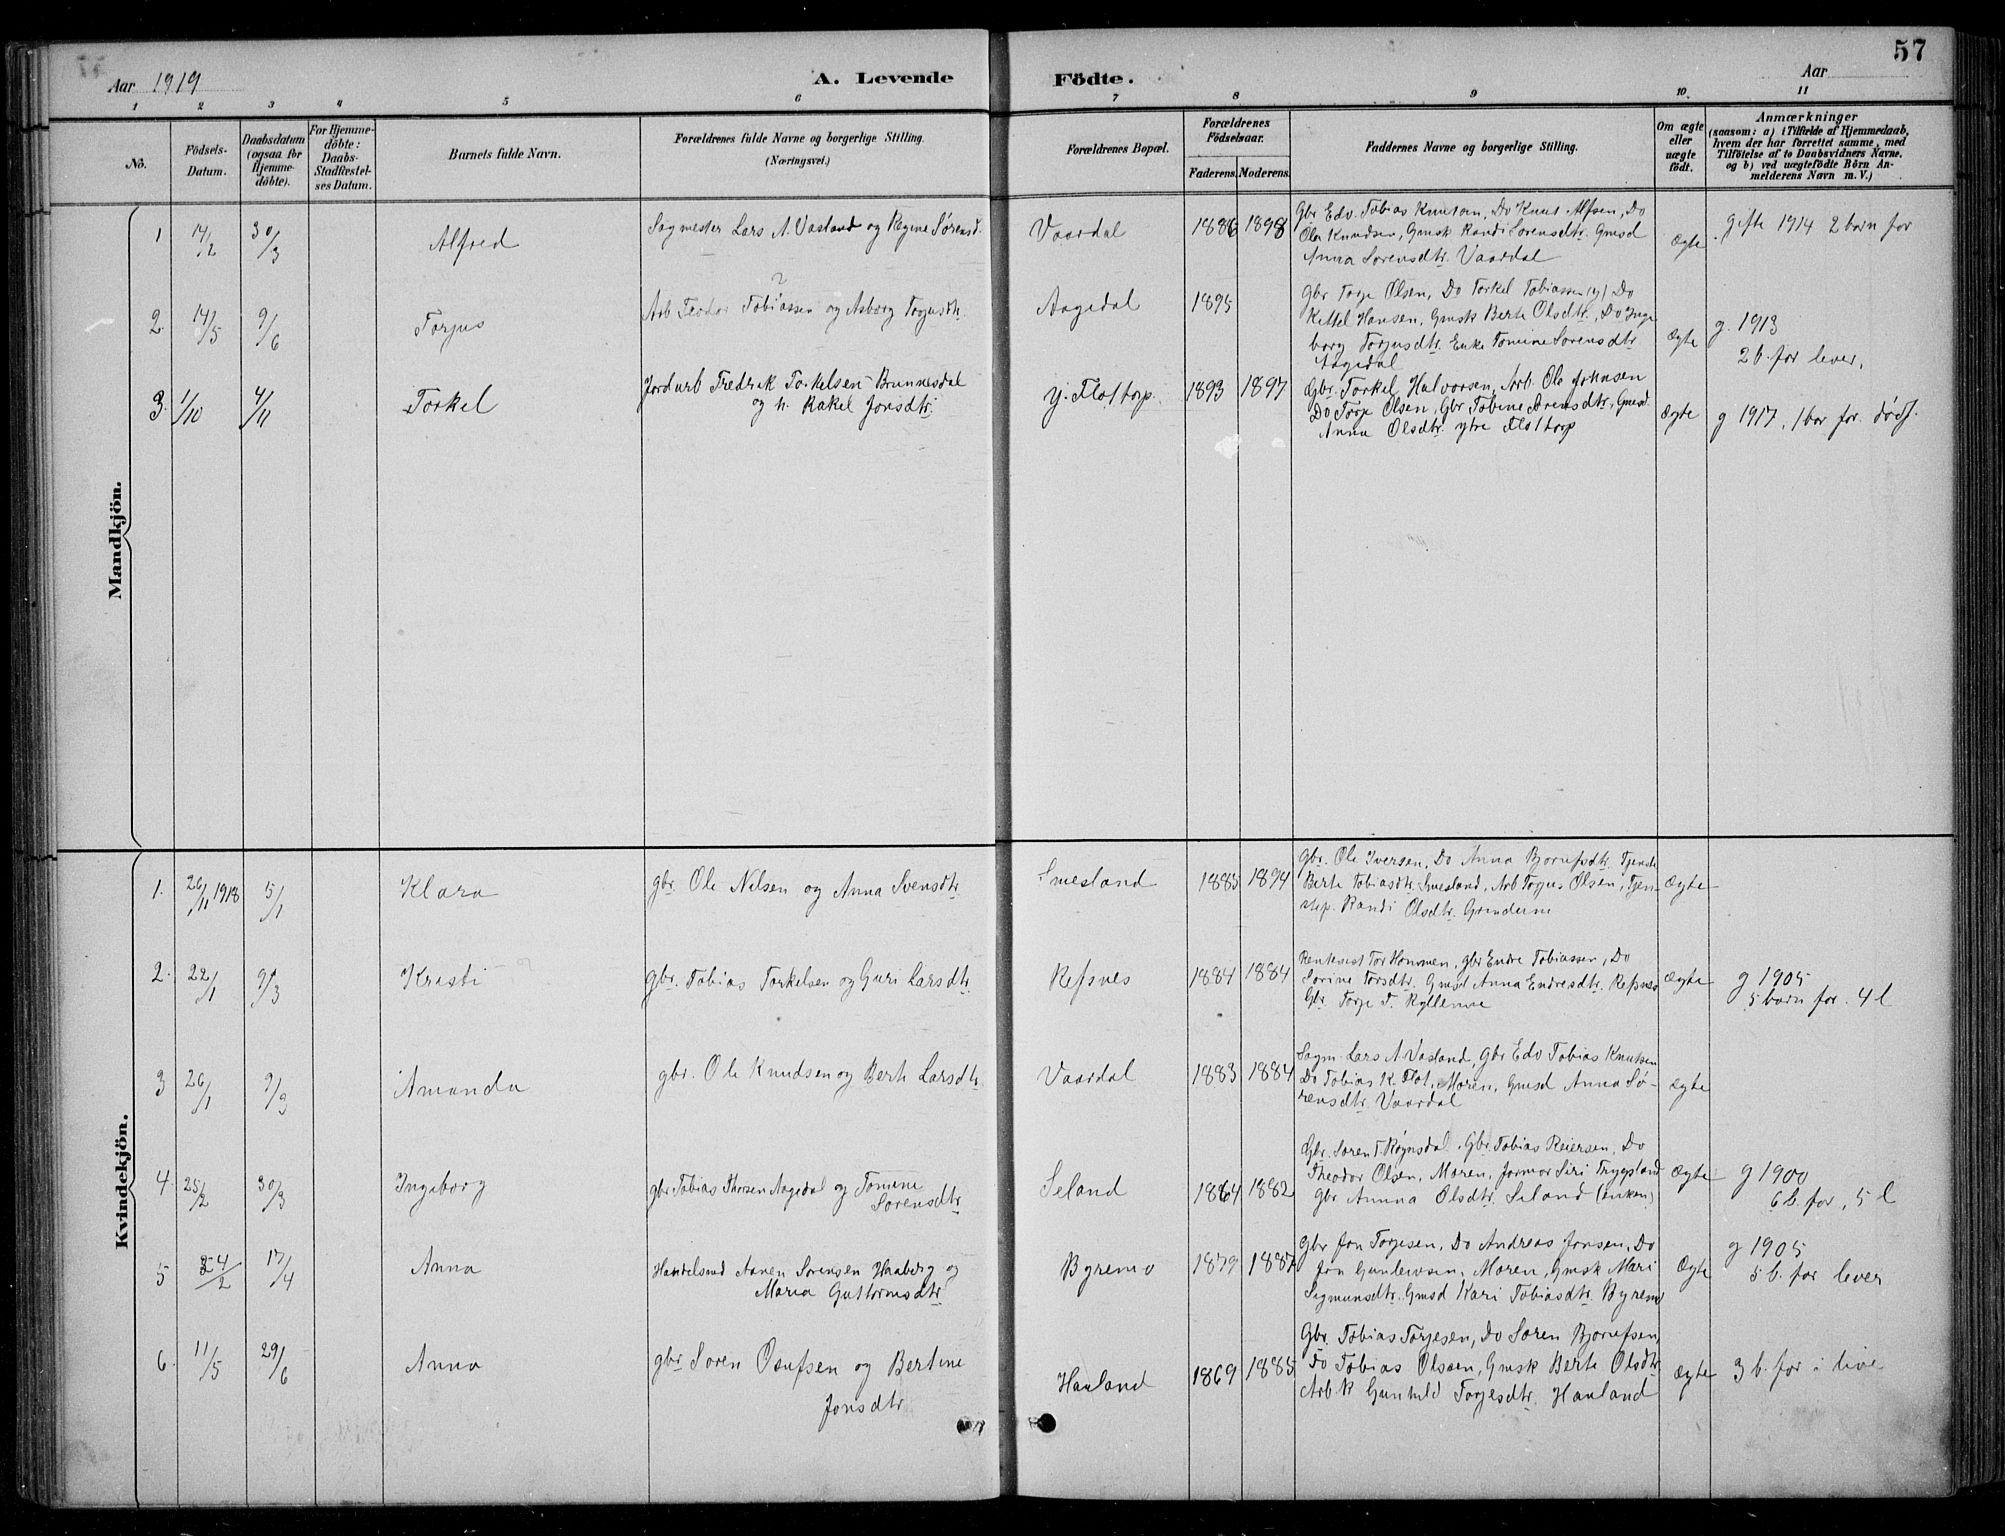 SAK, Bjelland sokneprestkontor, F/Fb/Fbc/L0003: Klokkerbok nr. B 3, 1887-1924, s. 57